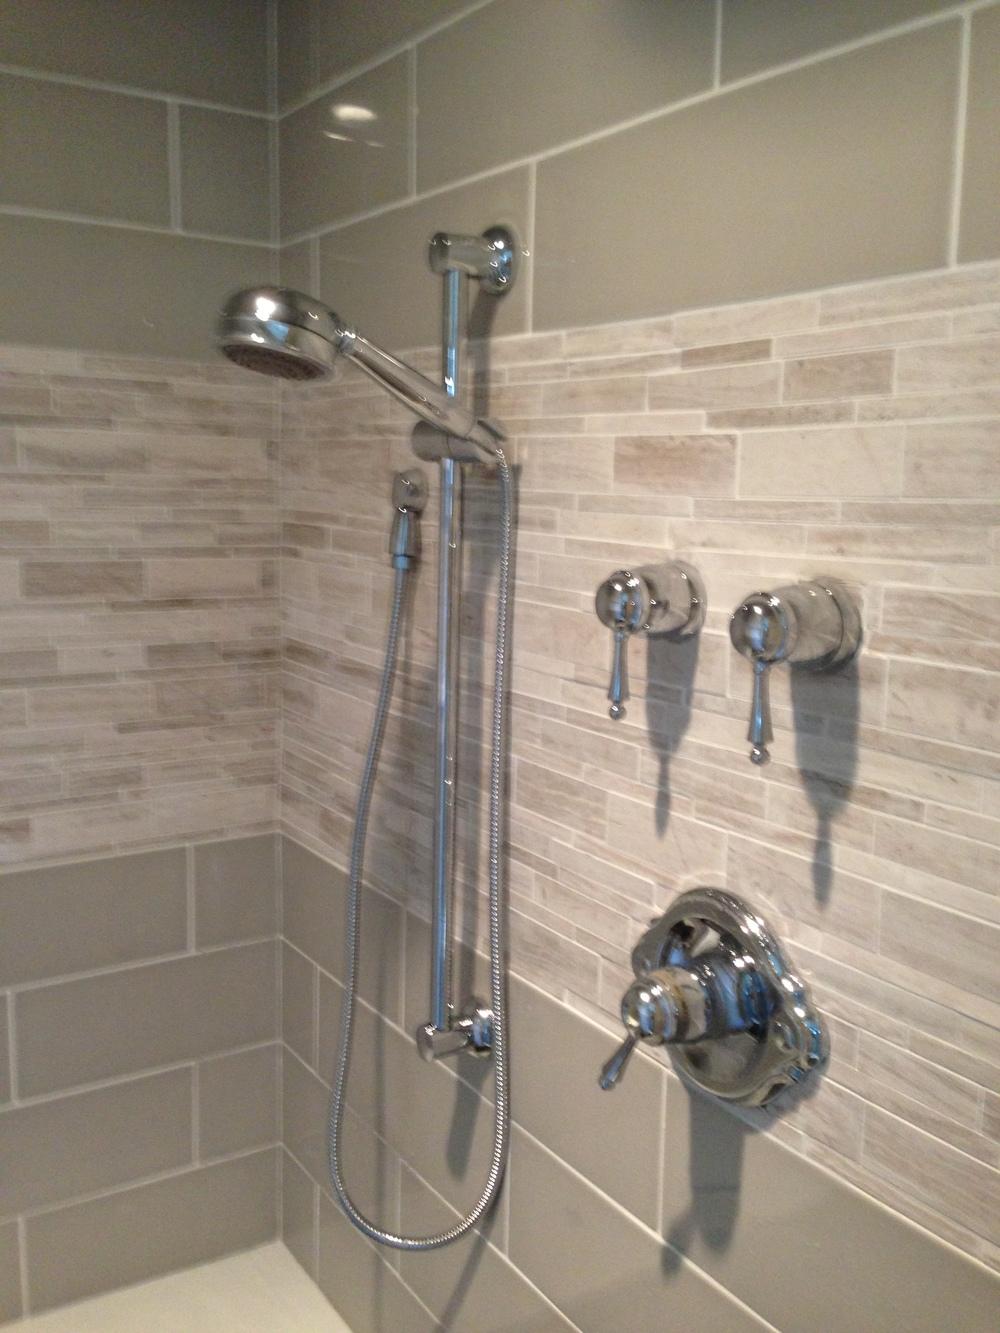 cvisions_bathroom_remodel12.JPG